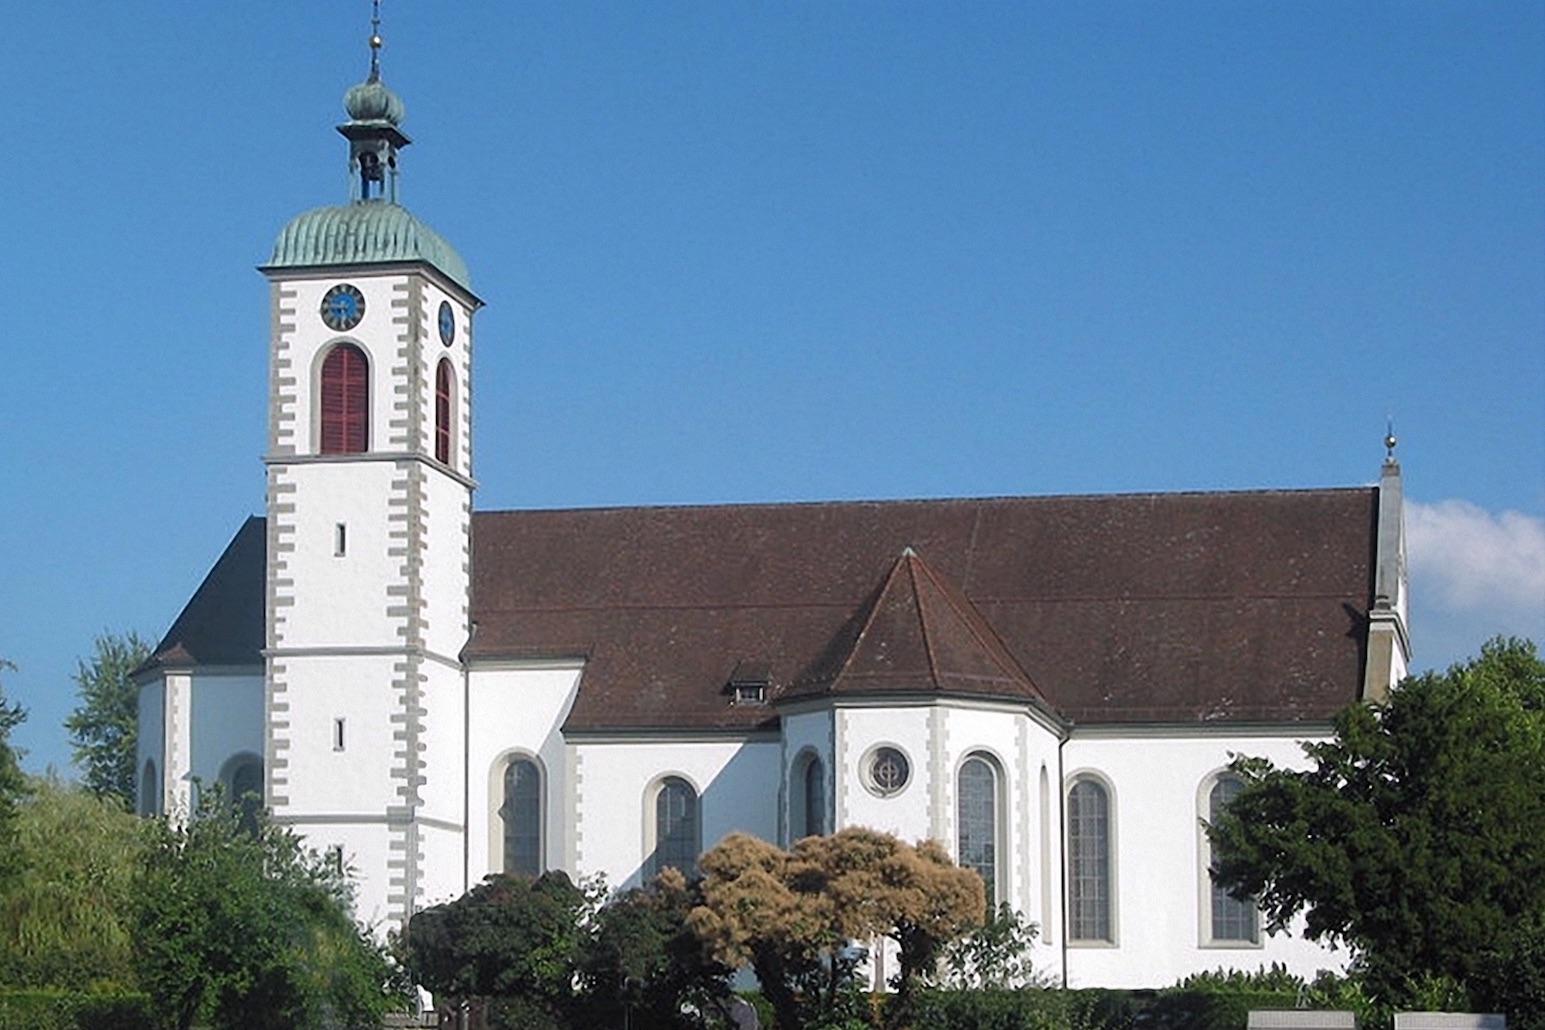 Hausmuseum des ehem. Klosters, Kreuzlingen